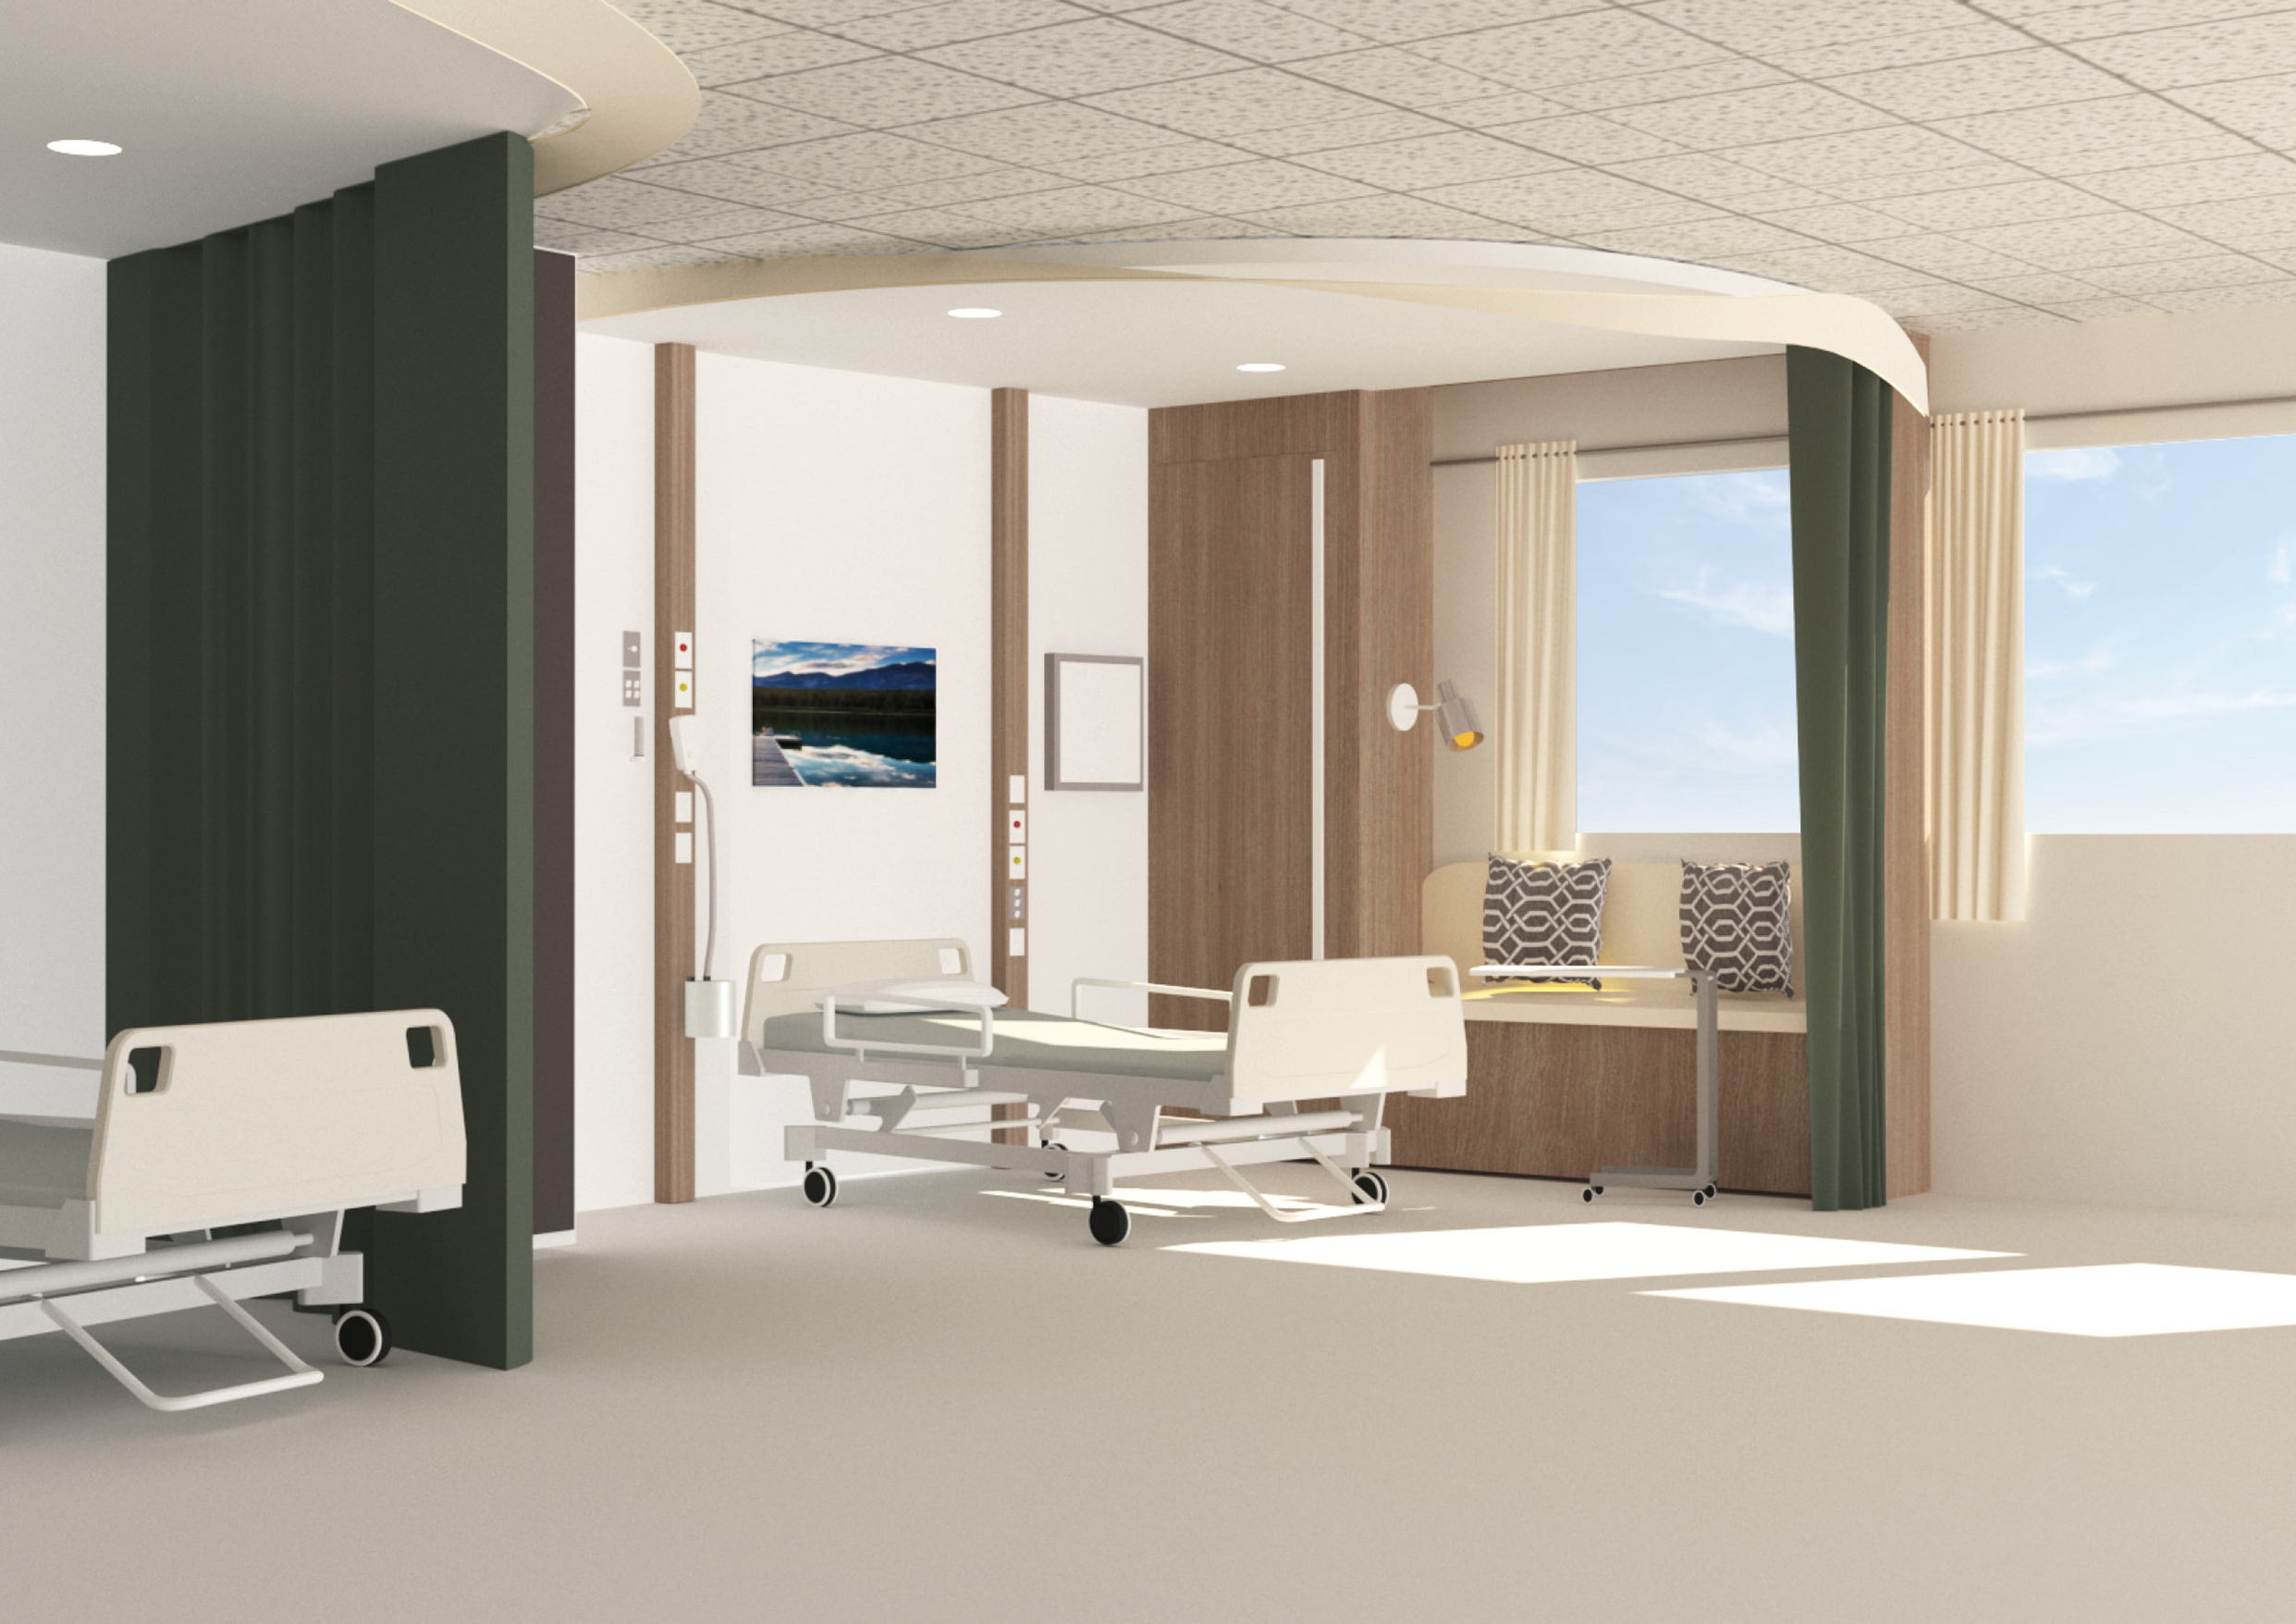 Good Health Design Integrated Studio VI 2019 – Ward Room